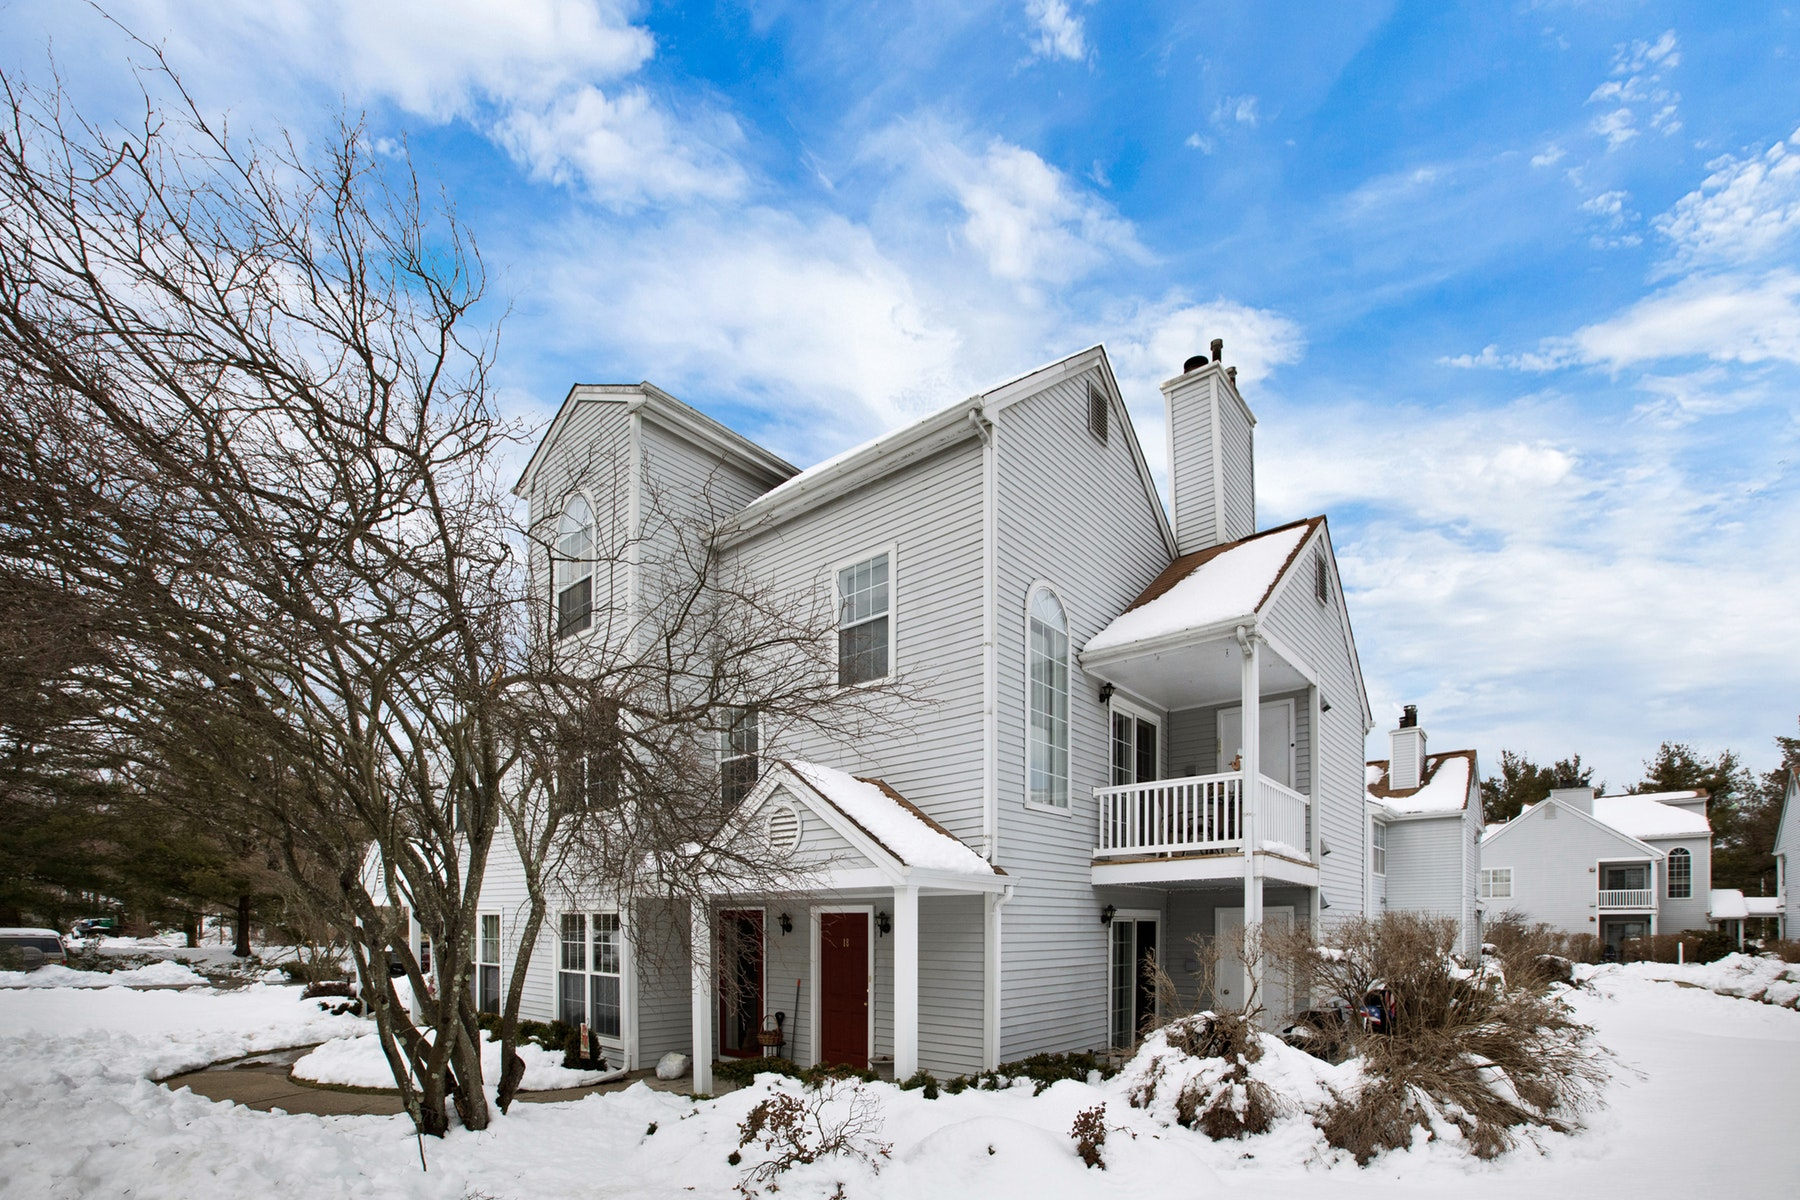 Residência urbana para Venda às Hilltop Farm Townhome 18 Homestead Lane Lincoln Park, Nova Jersey 07035 Estados Unidos